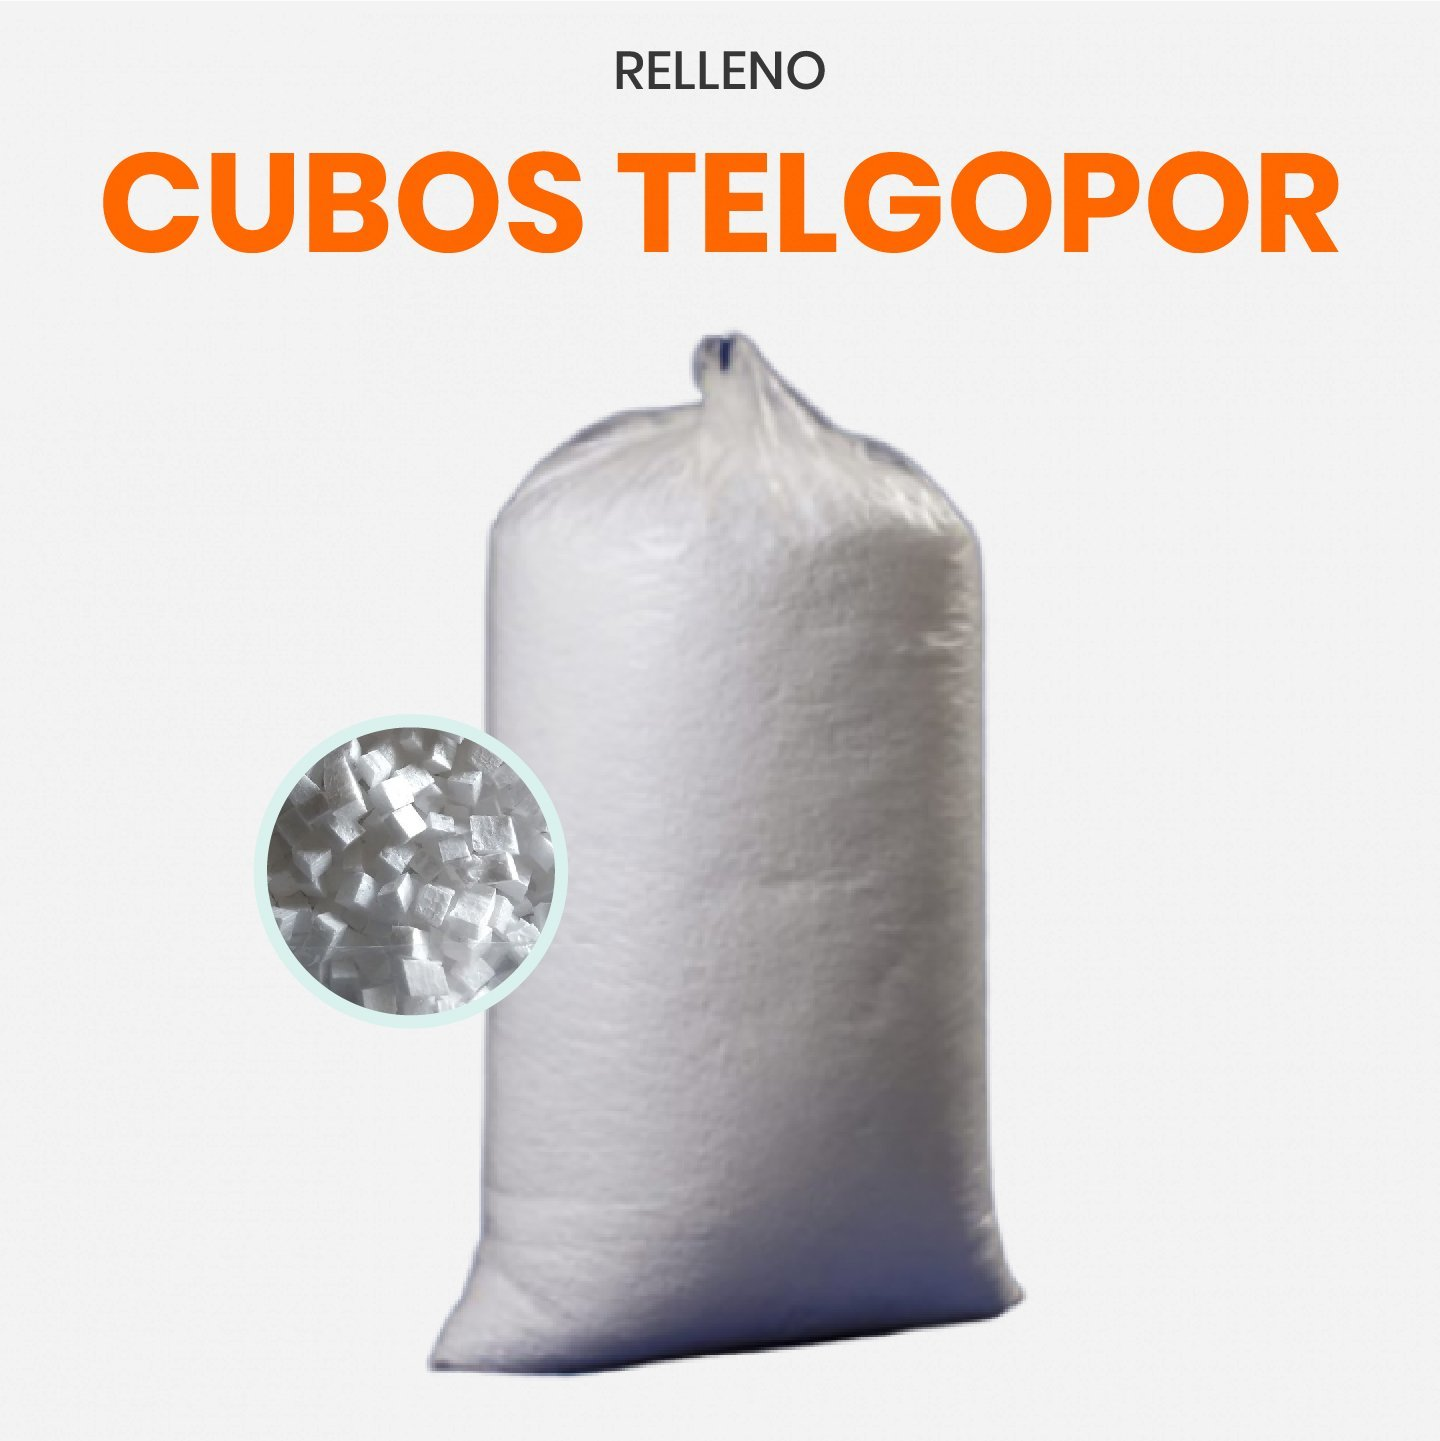 Relleno cubos de telgopor 1 kg x 2 unidades